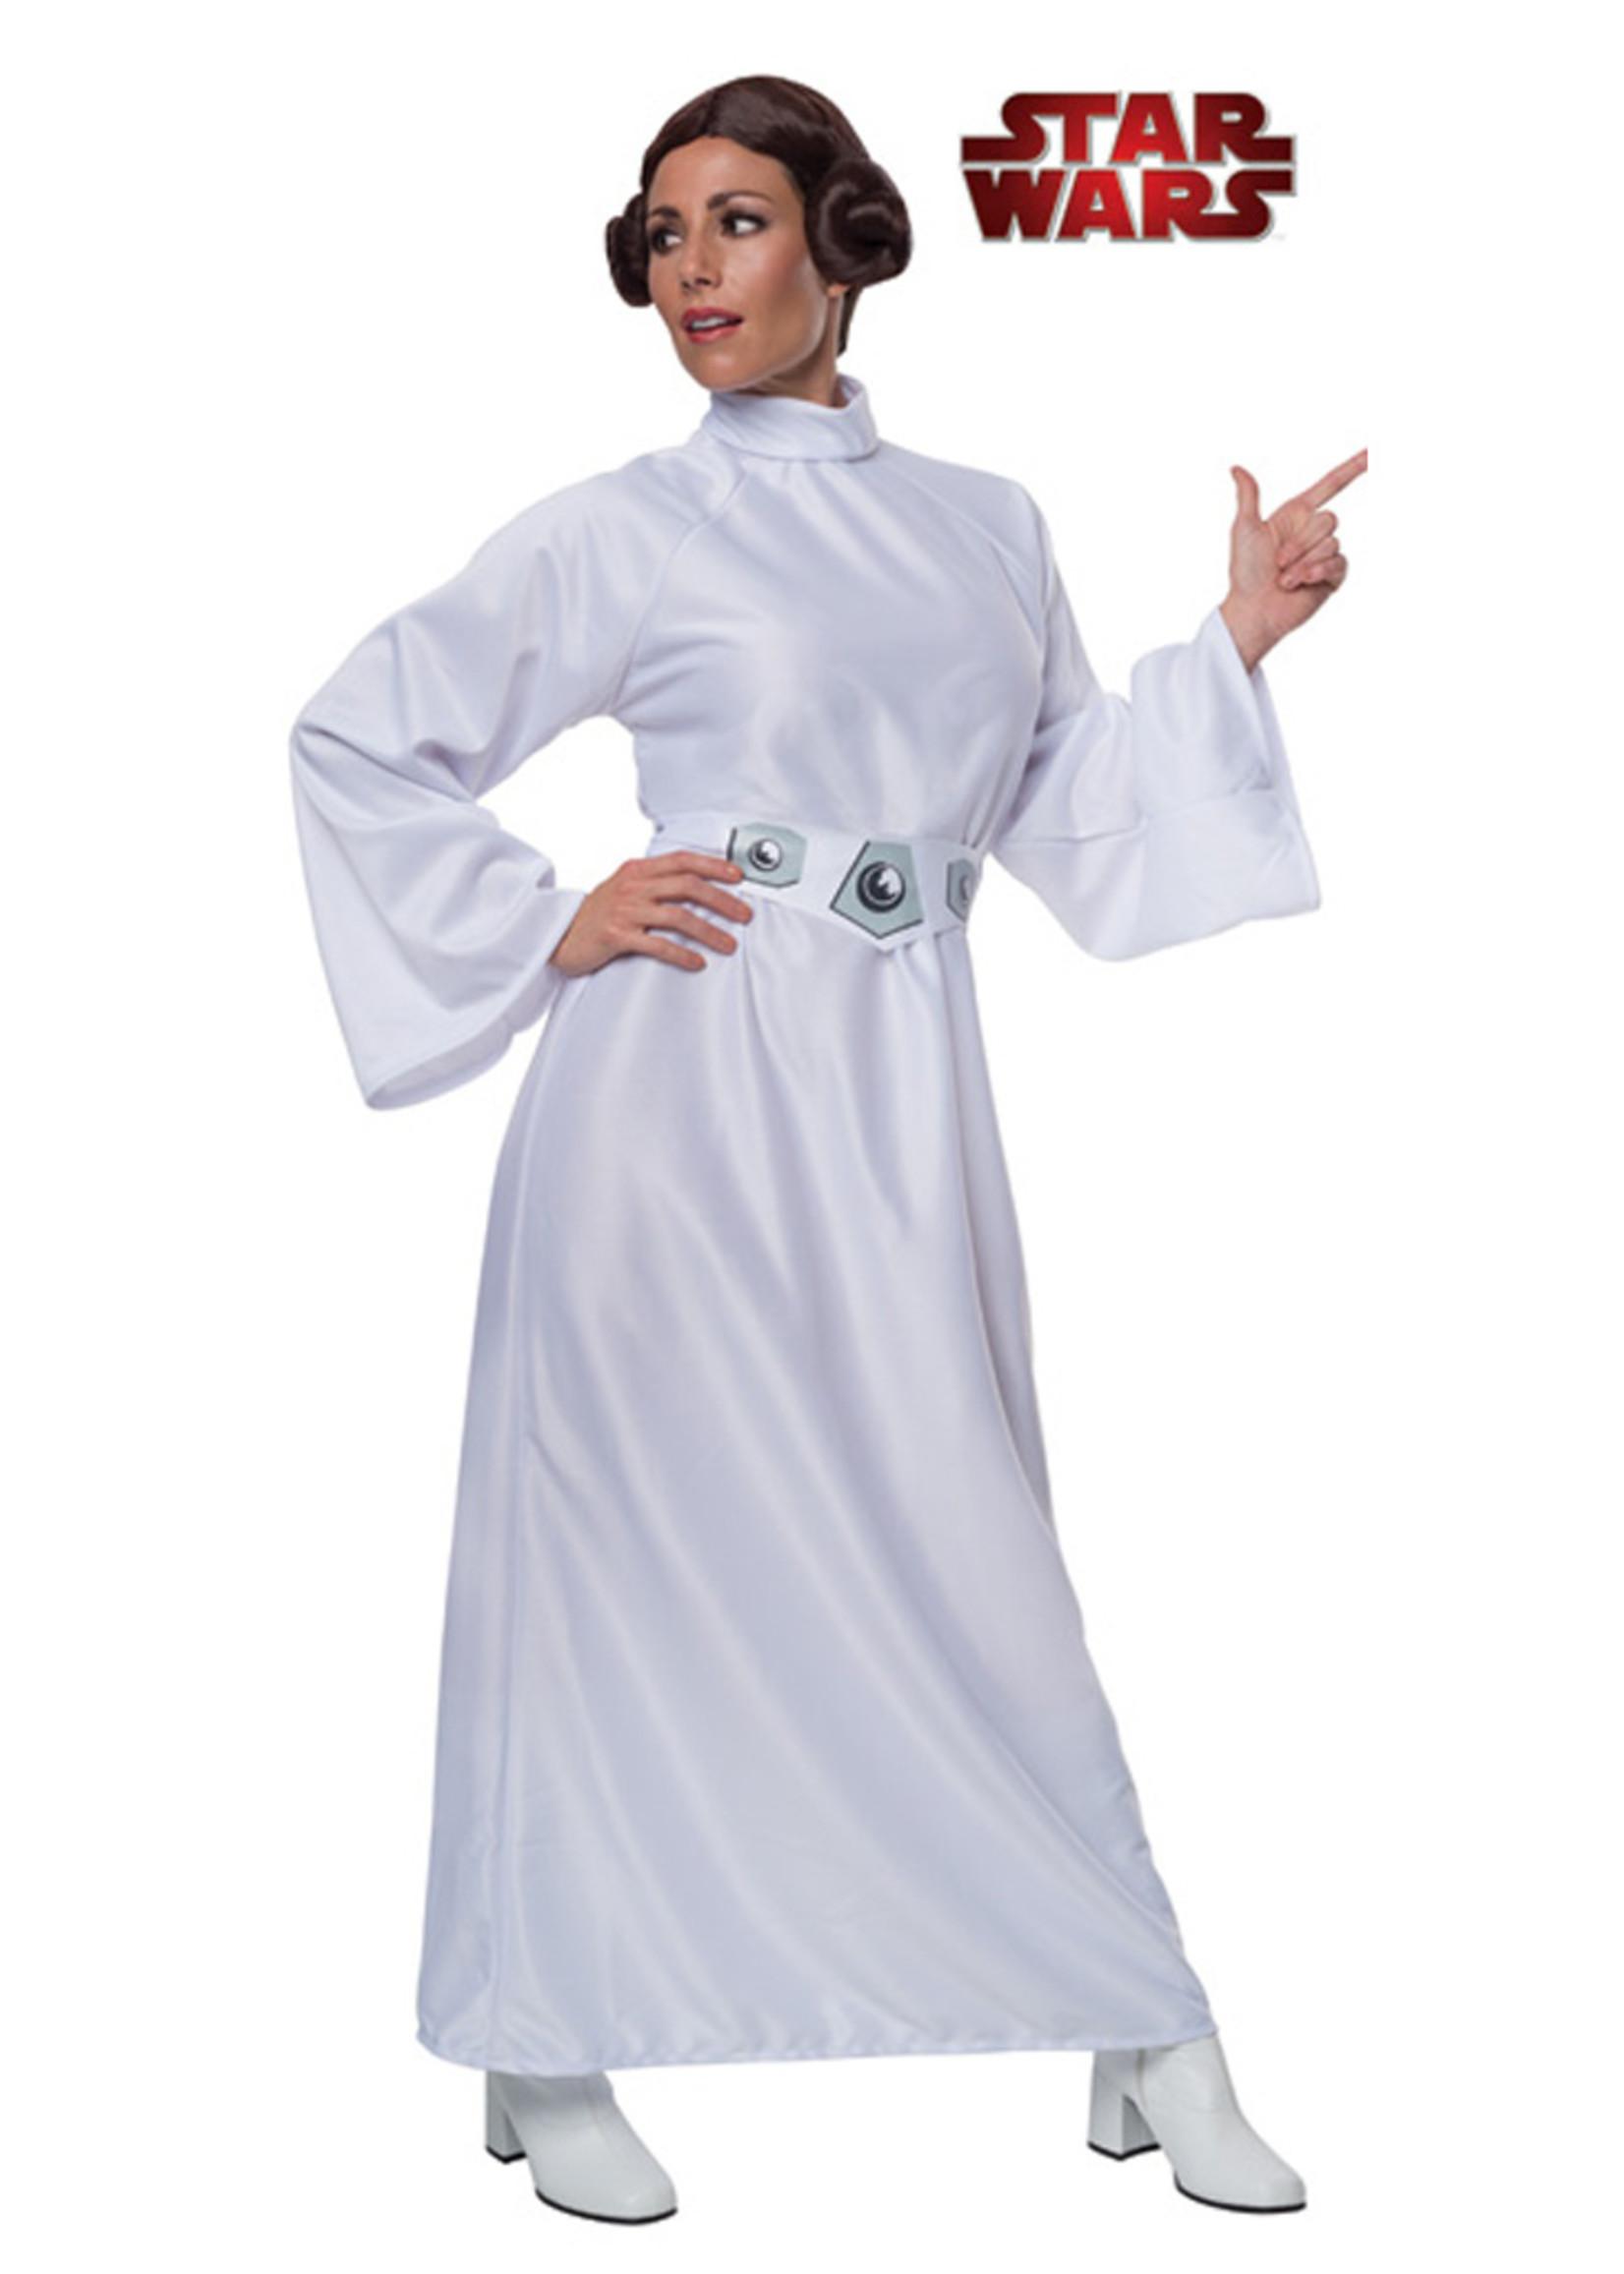 Princess Leia Costume - Women's